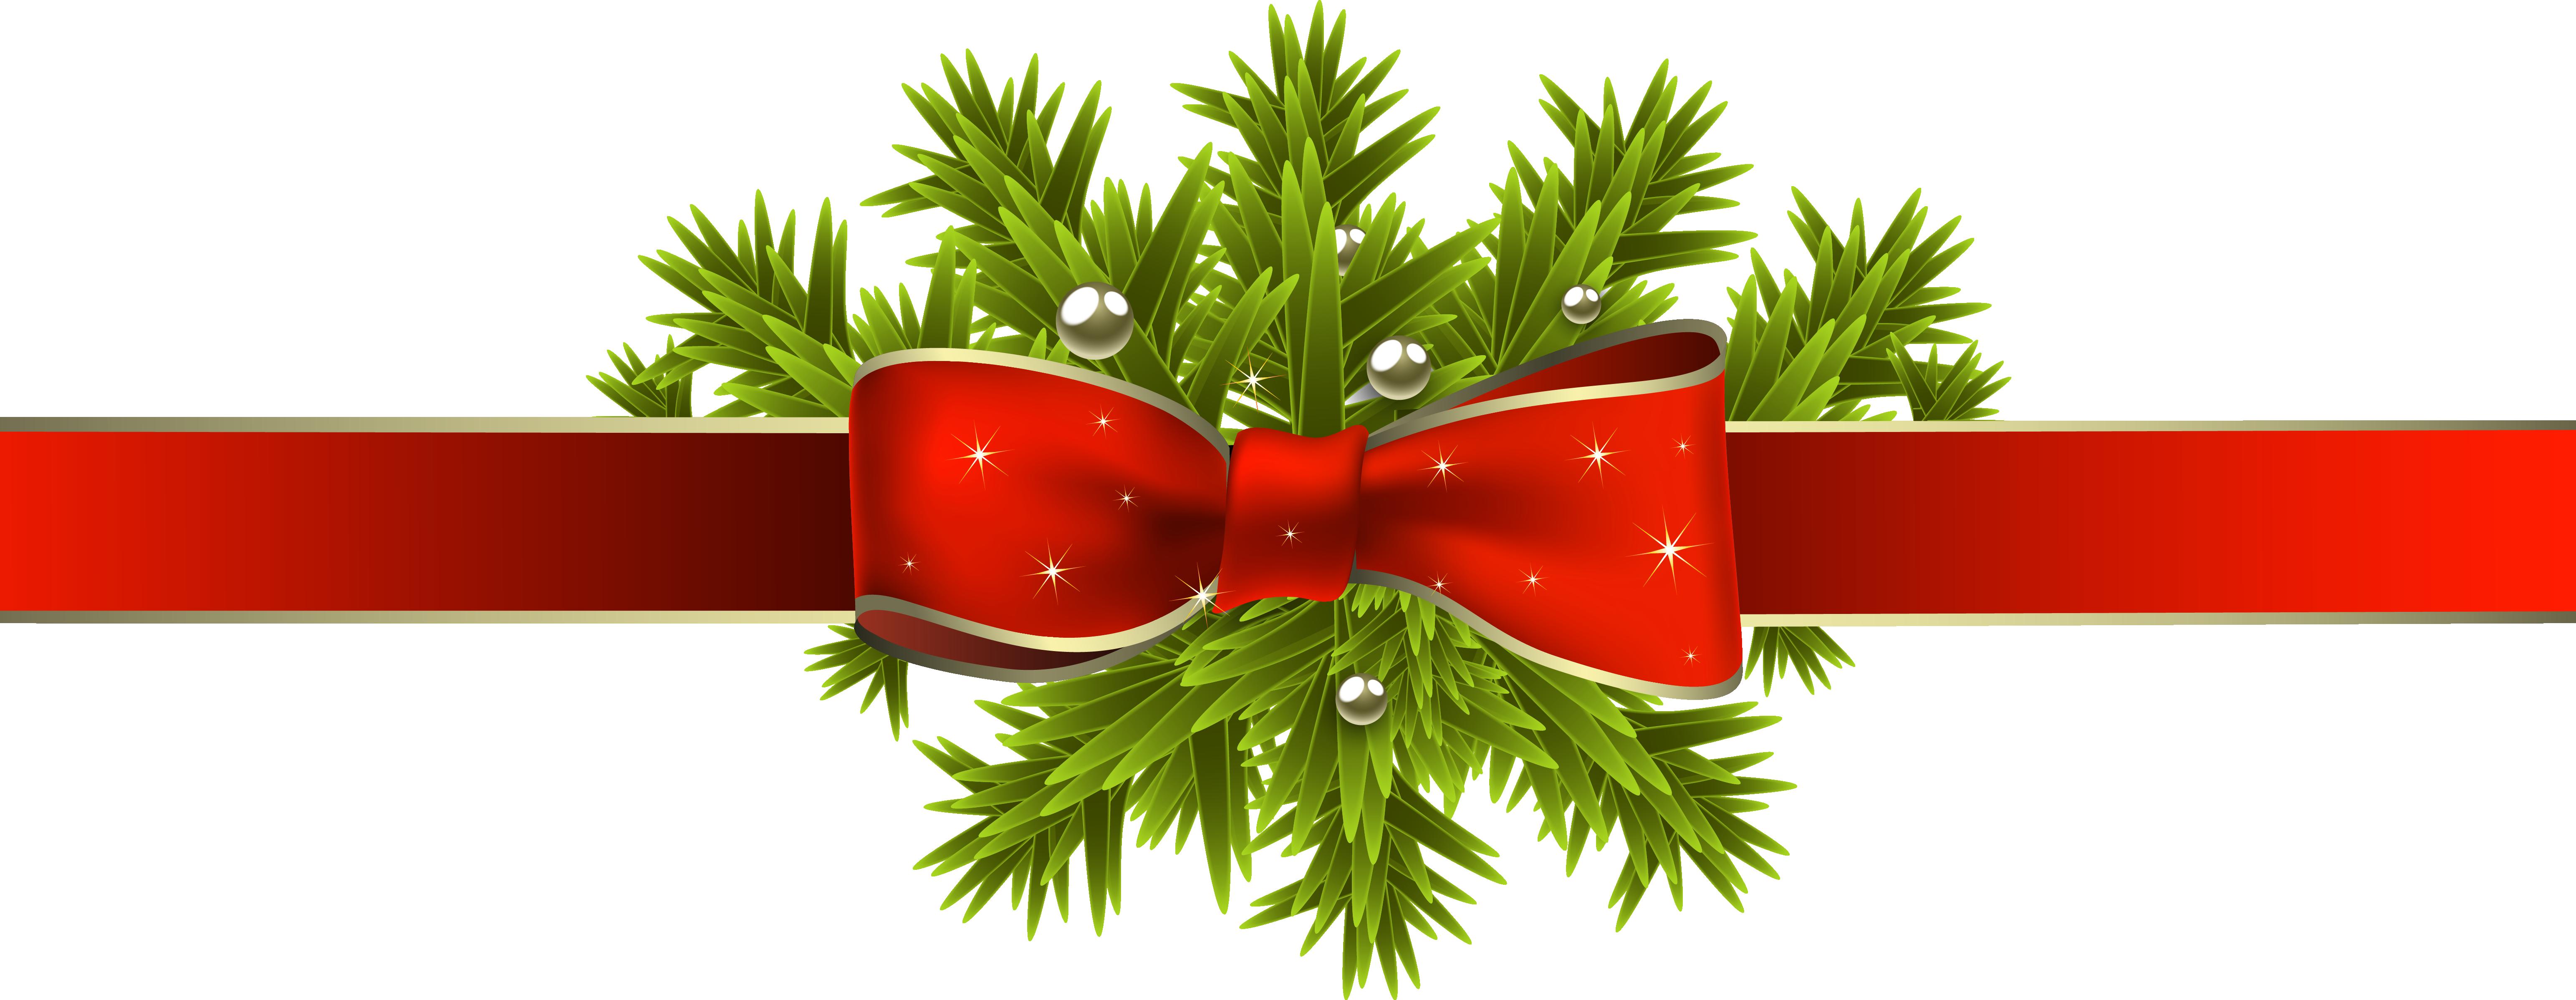 Christmas ribbons clipart clip transparent library Free Christmas Ribbon Cliparts, Download Free Clip Art, Free Clip ... clip transparent library